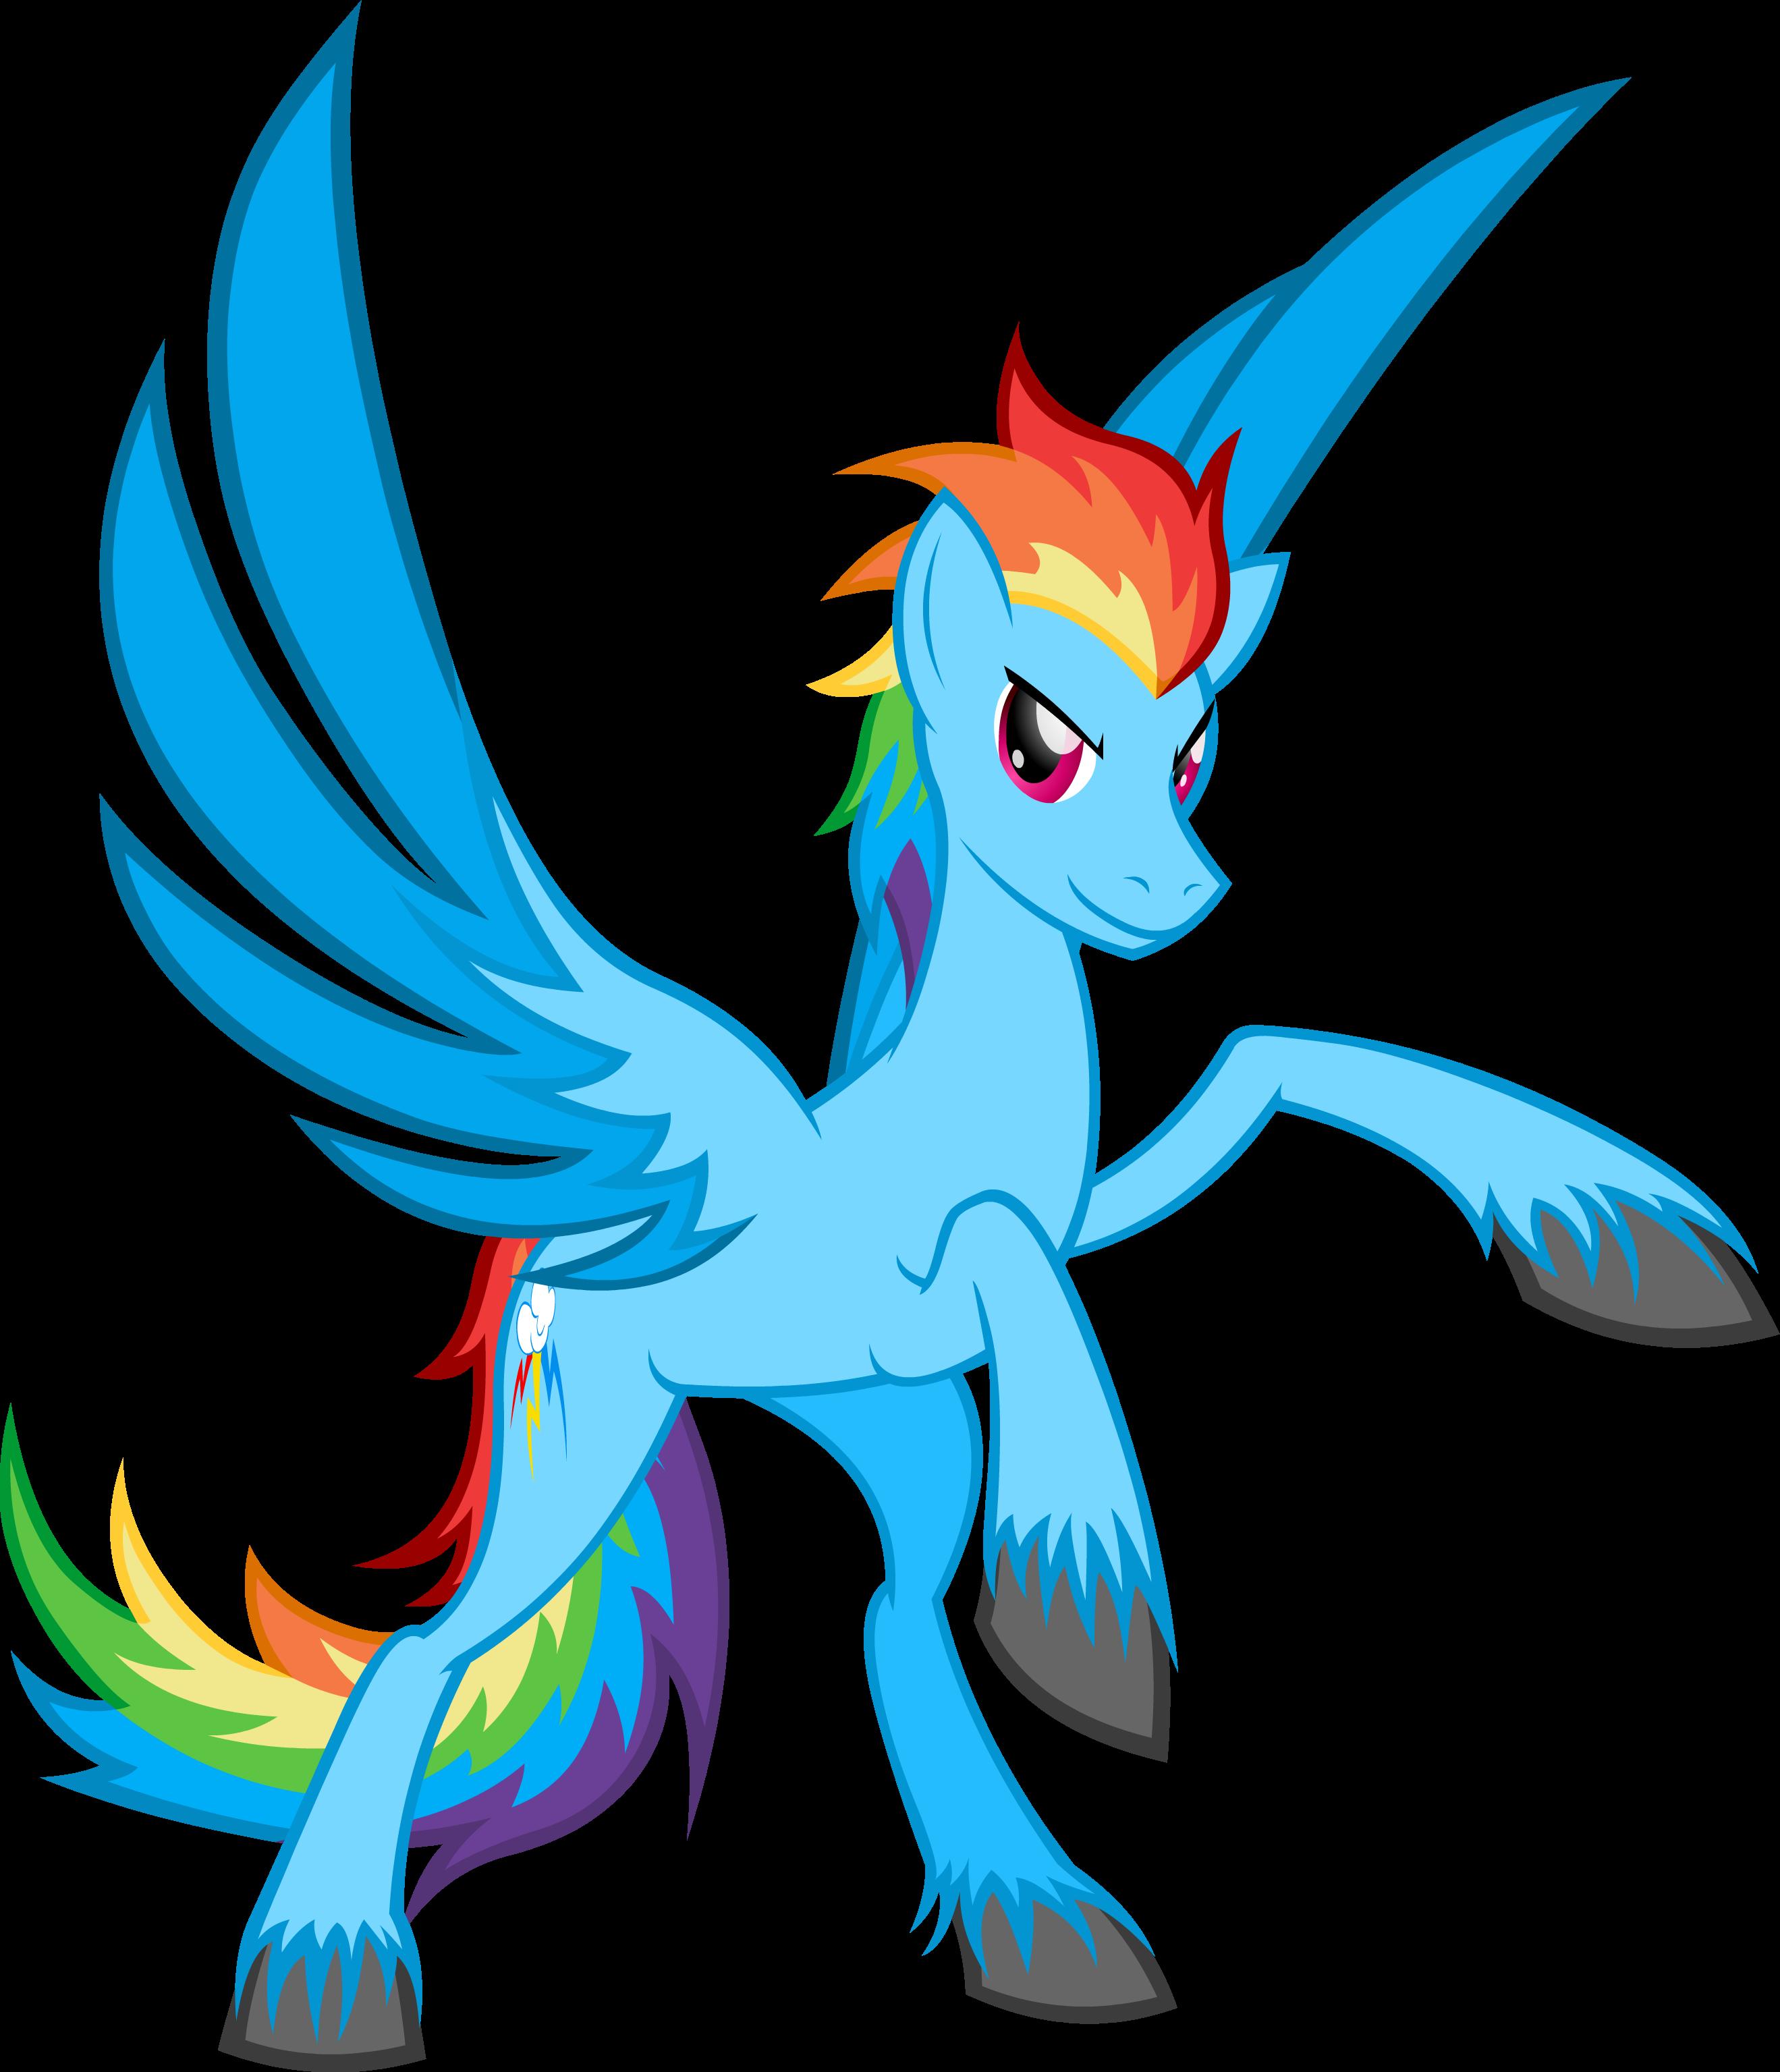 RainbowJET by Nemesis360